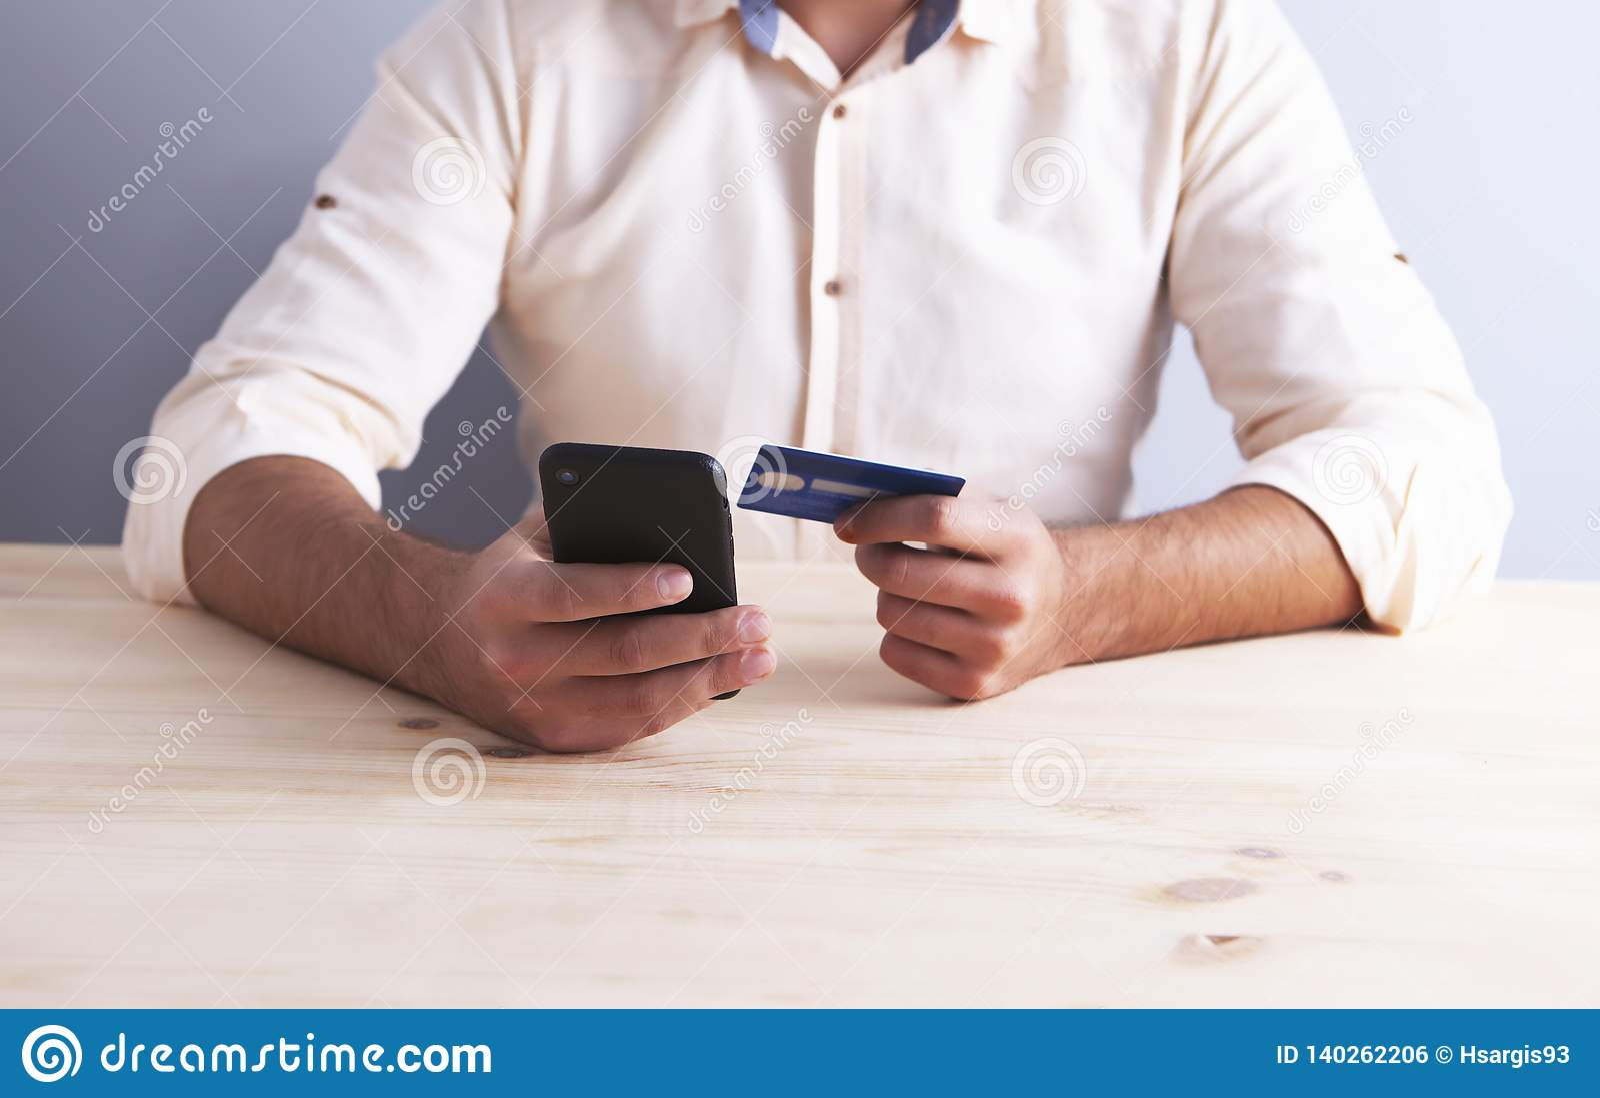 Bank card businessman phone